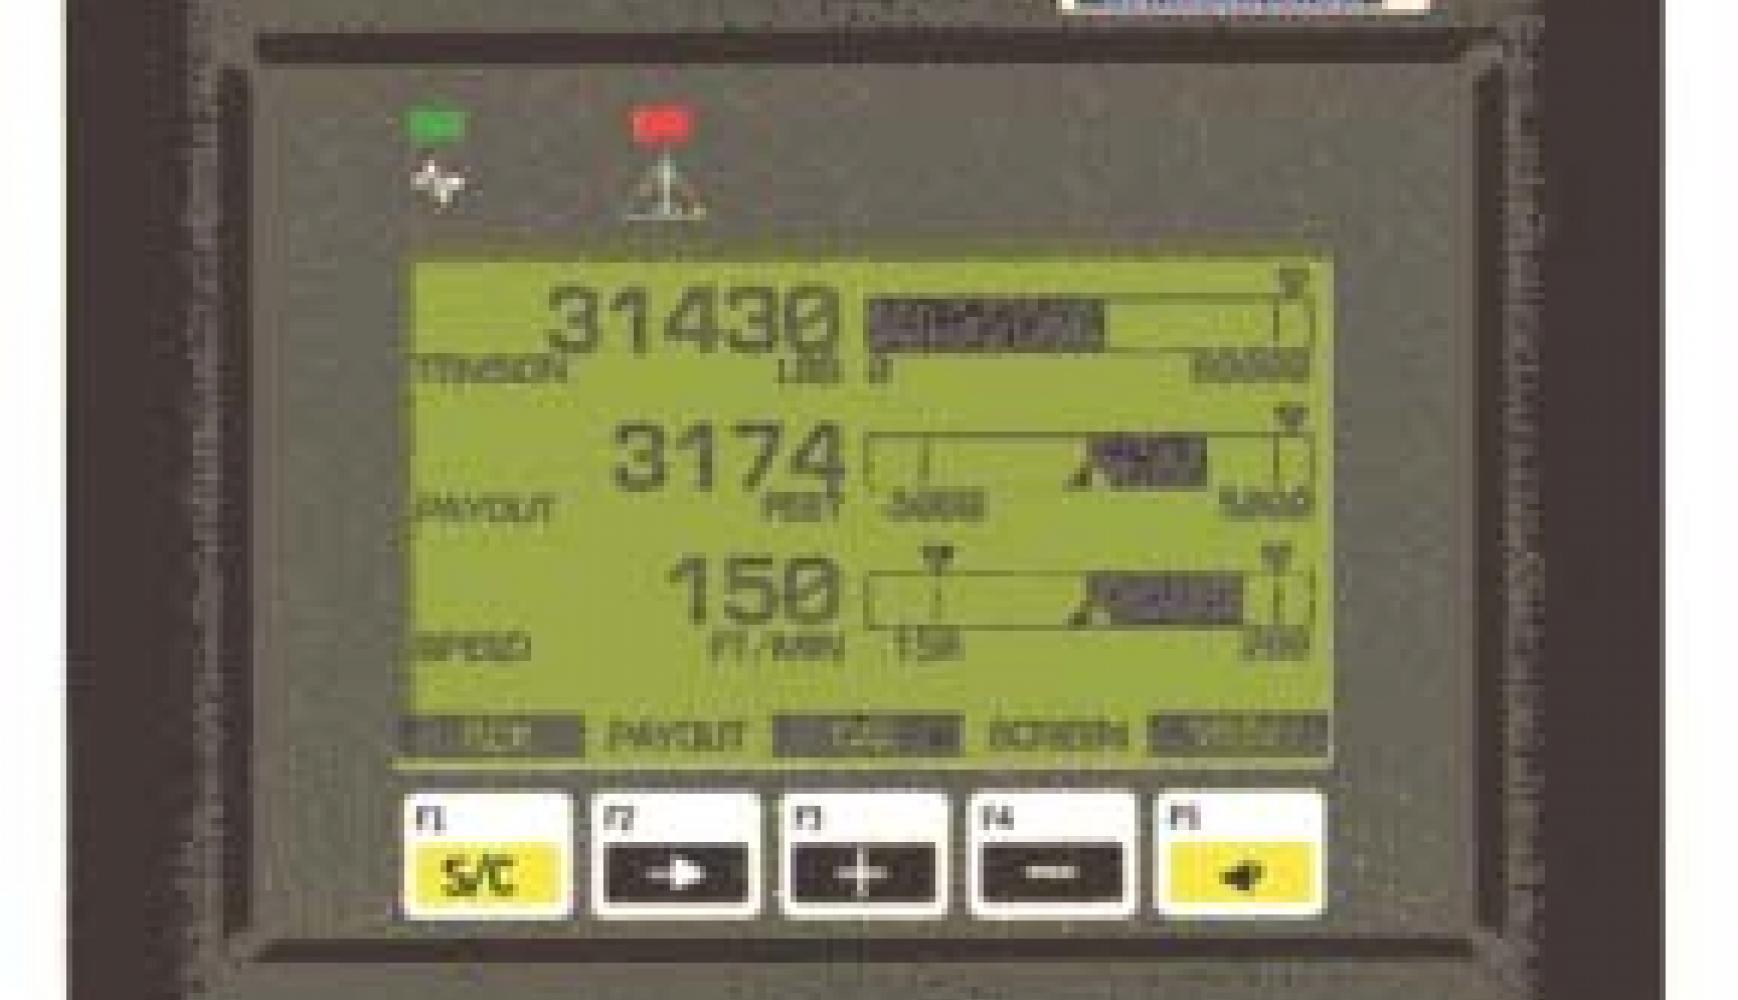 Obsolete LM2000